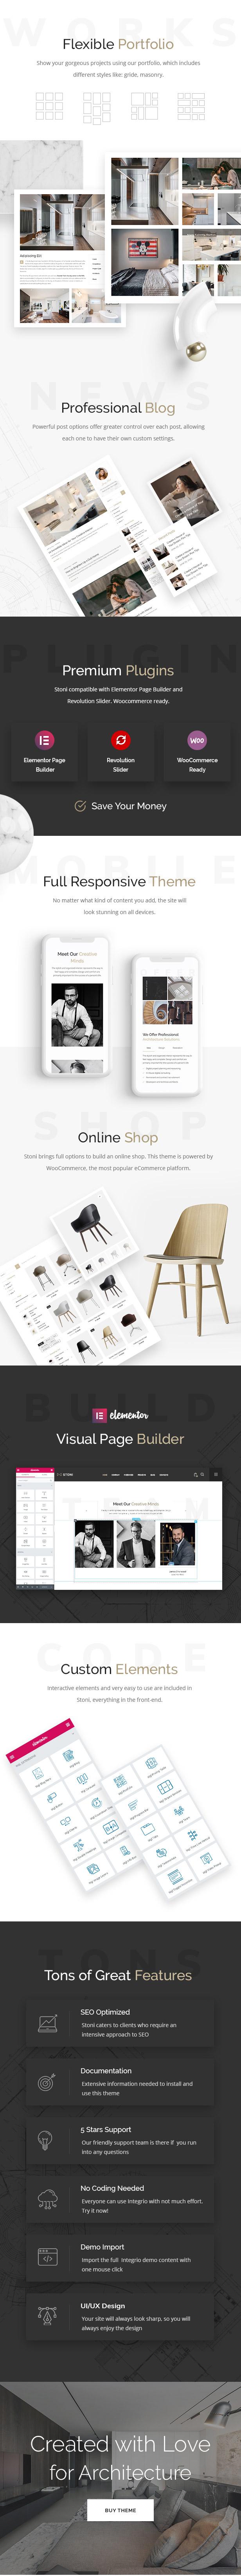 Stoni - Architecture & Interior Design Agency WordPress Theme - 3